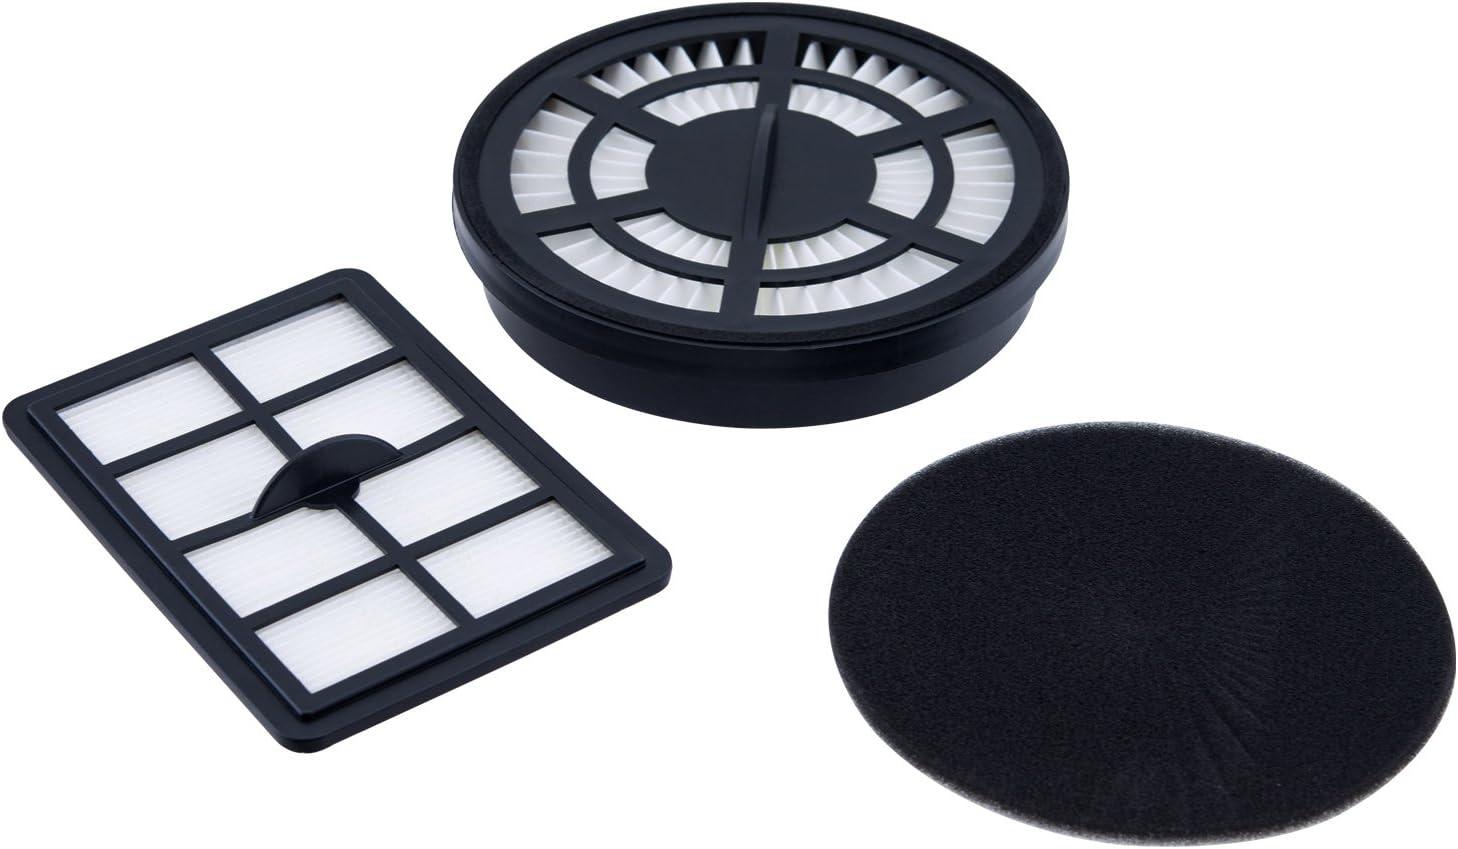 H. Koenig SL8 - Set de filtros para la aspiradora modelos SLC80, SLC85, SLS810, SLS890: Amazon.es: Hogar